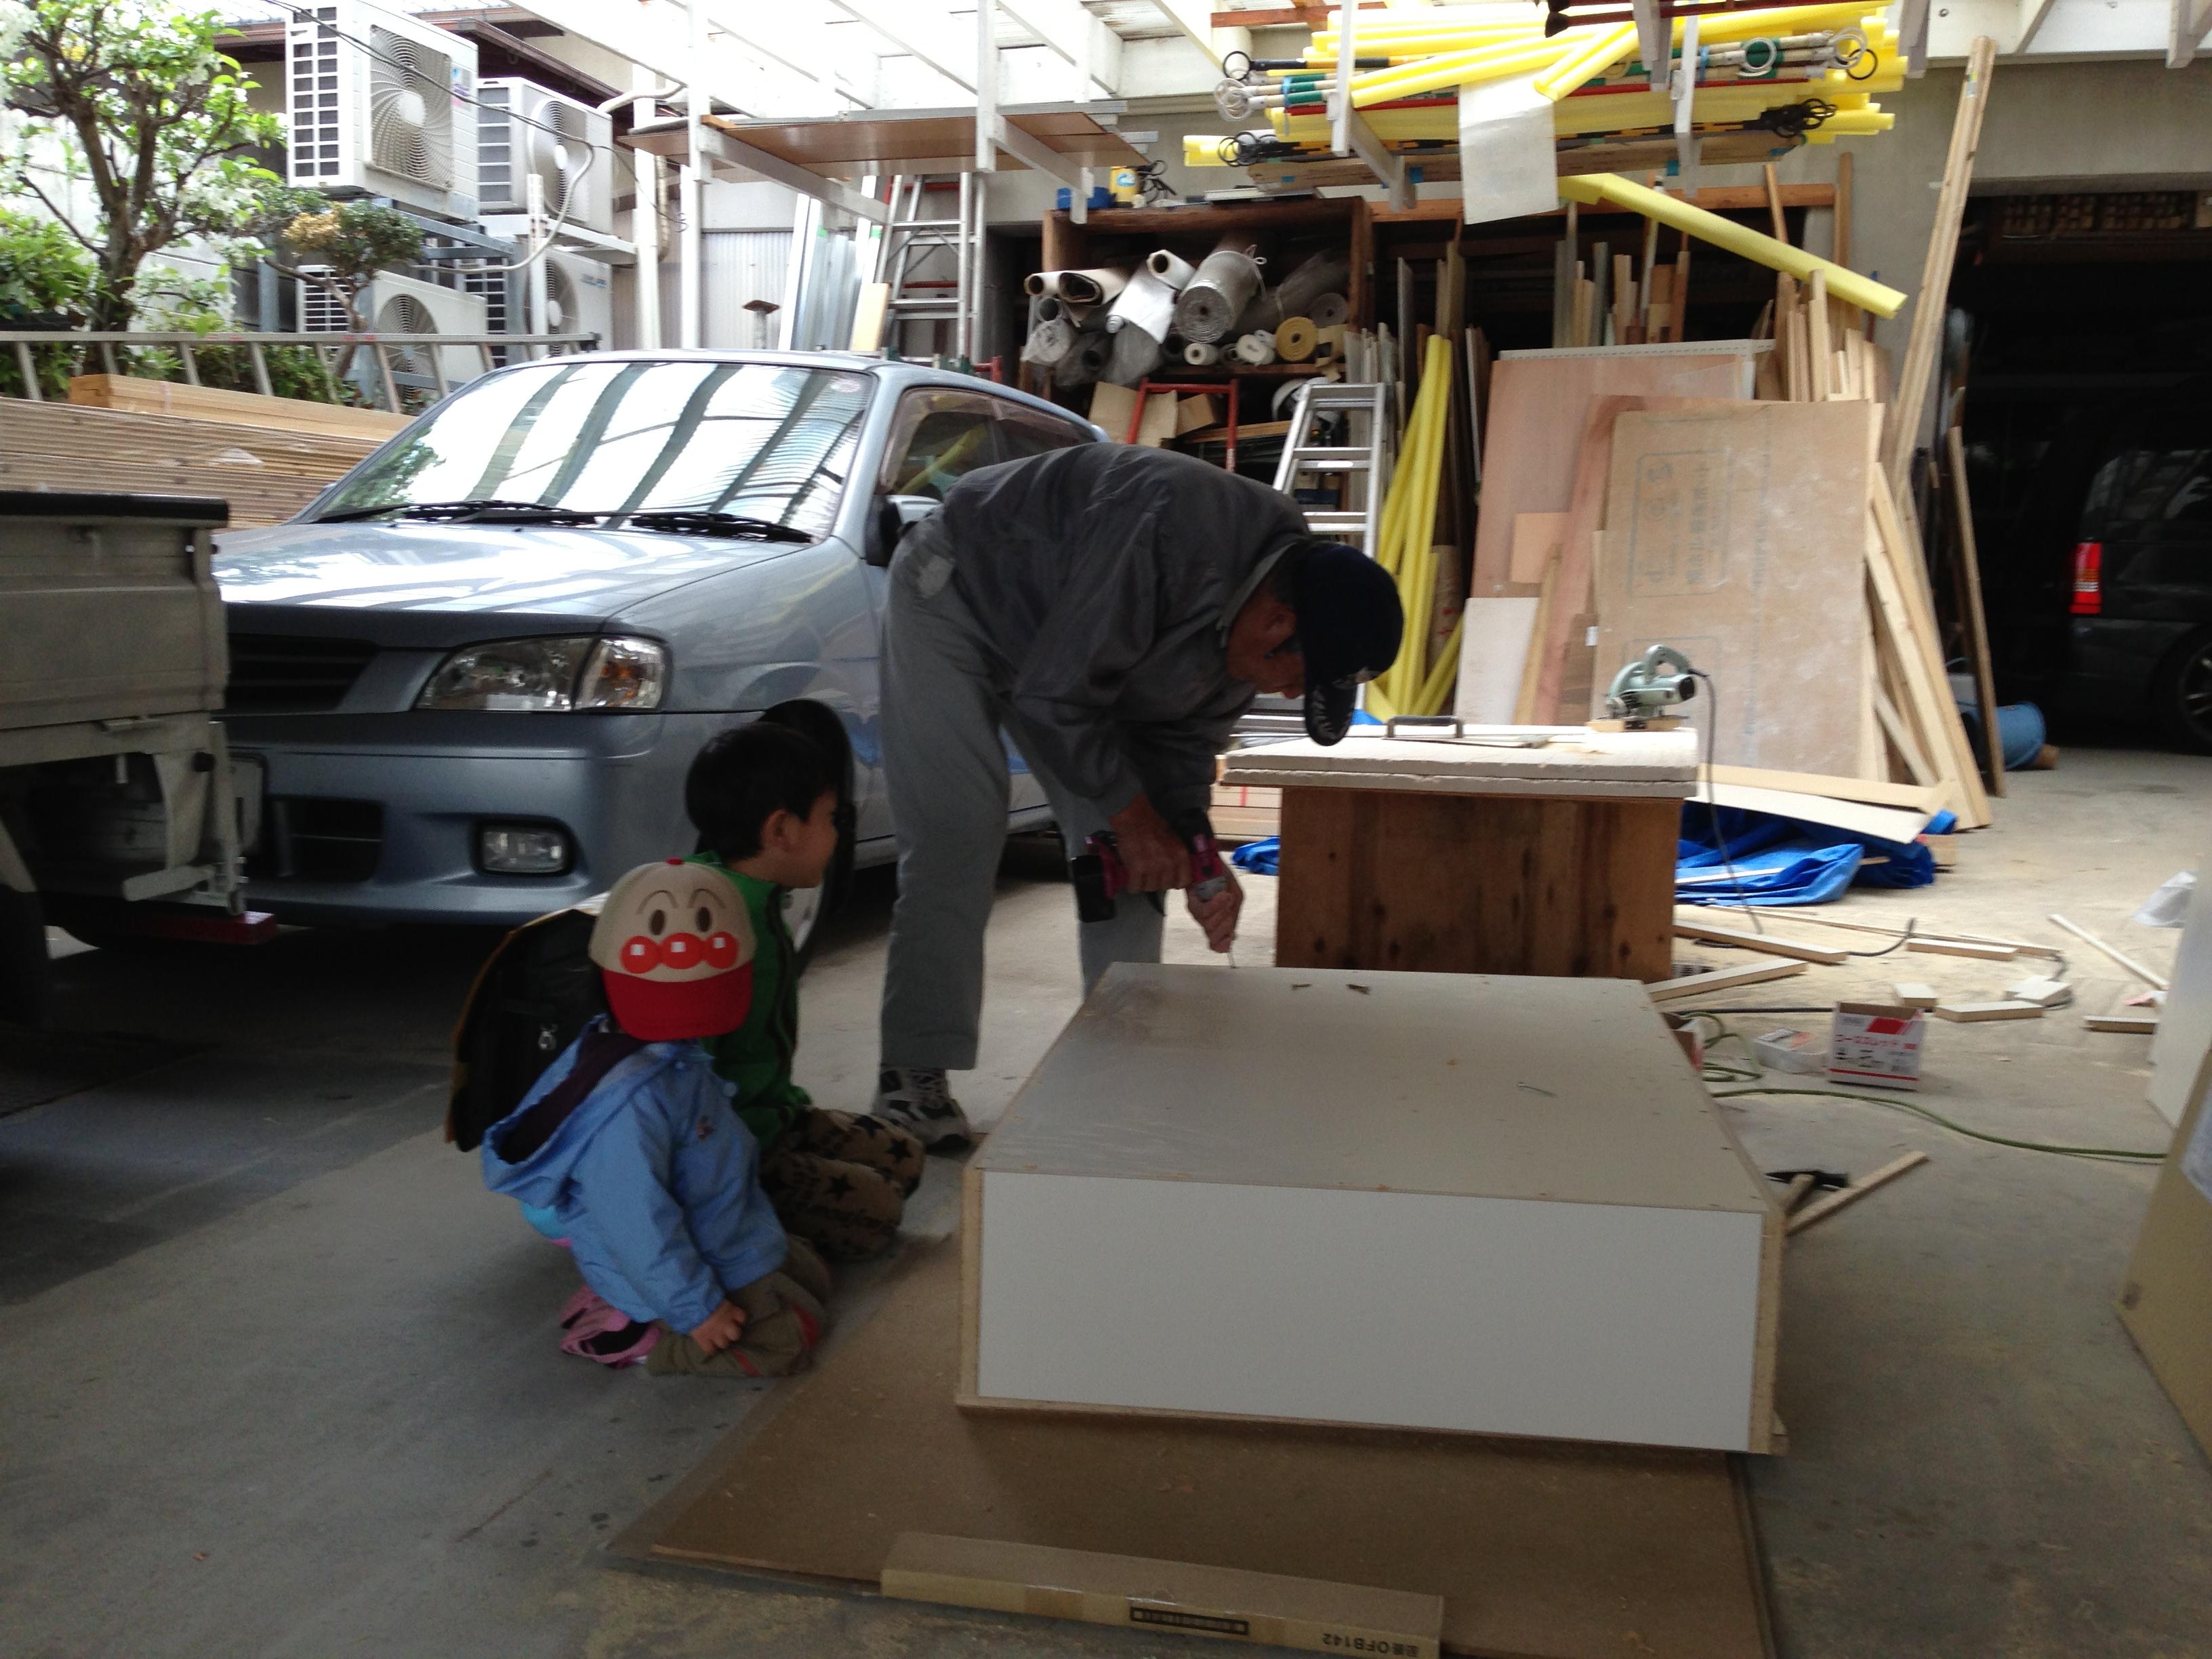 http://www.okadakomuten.com/blog1_img/2013-04-11%2013.49.55.jpg